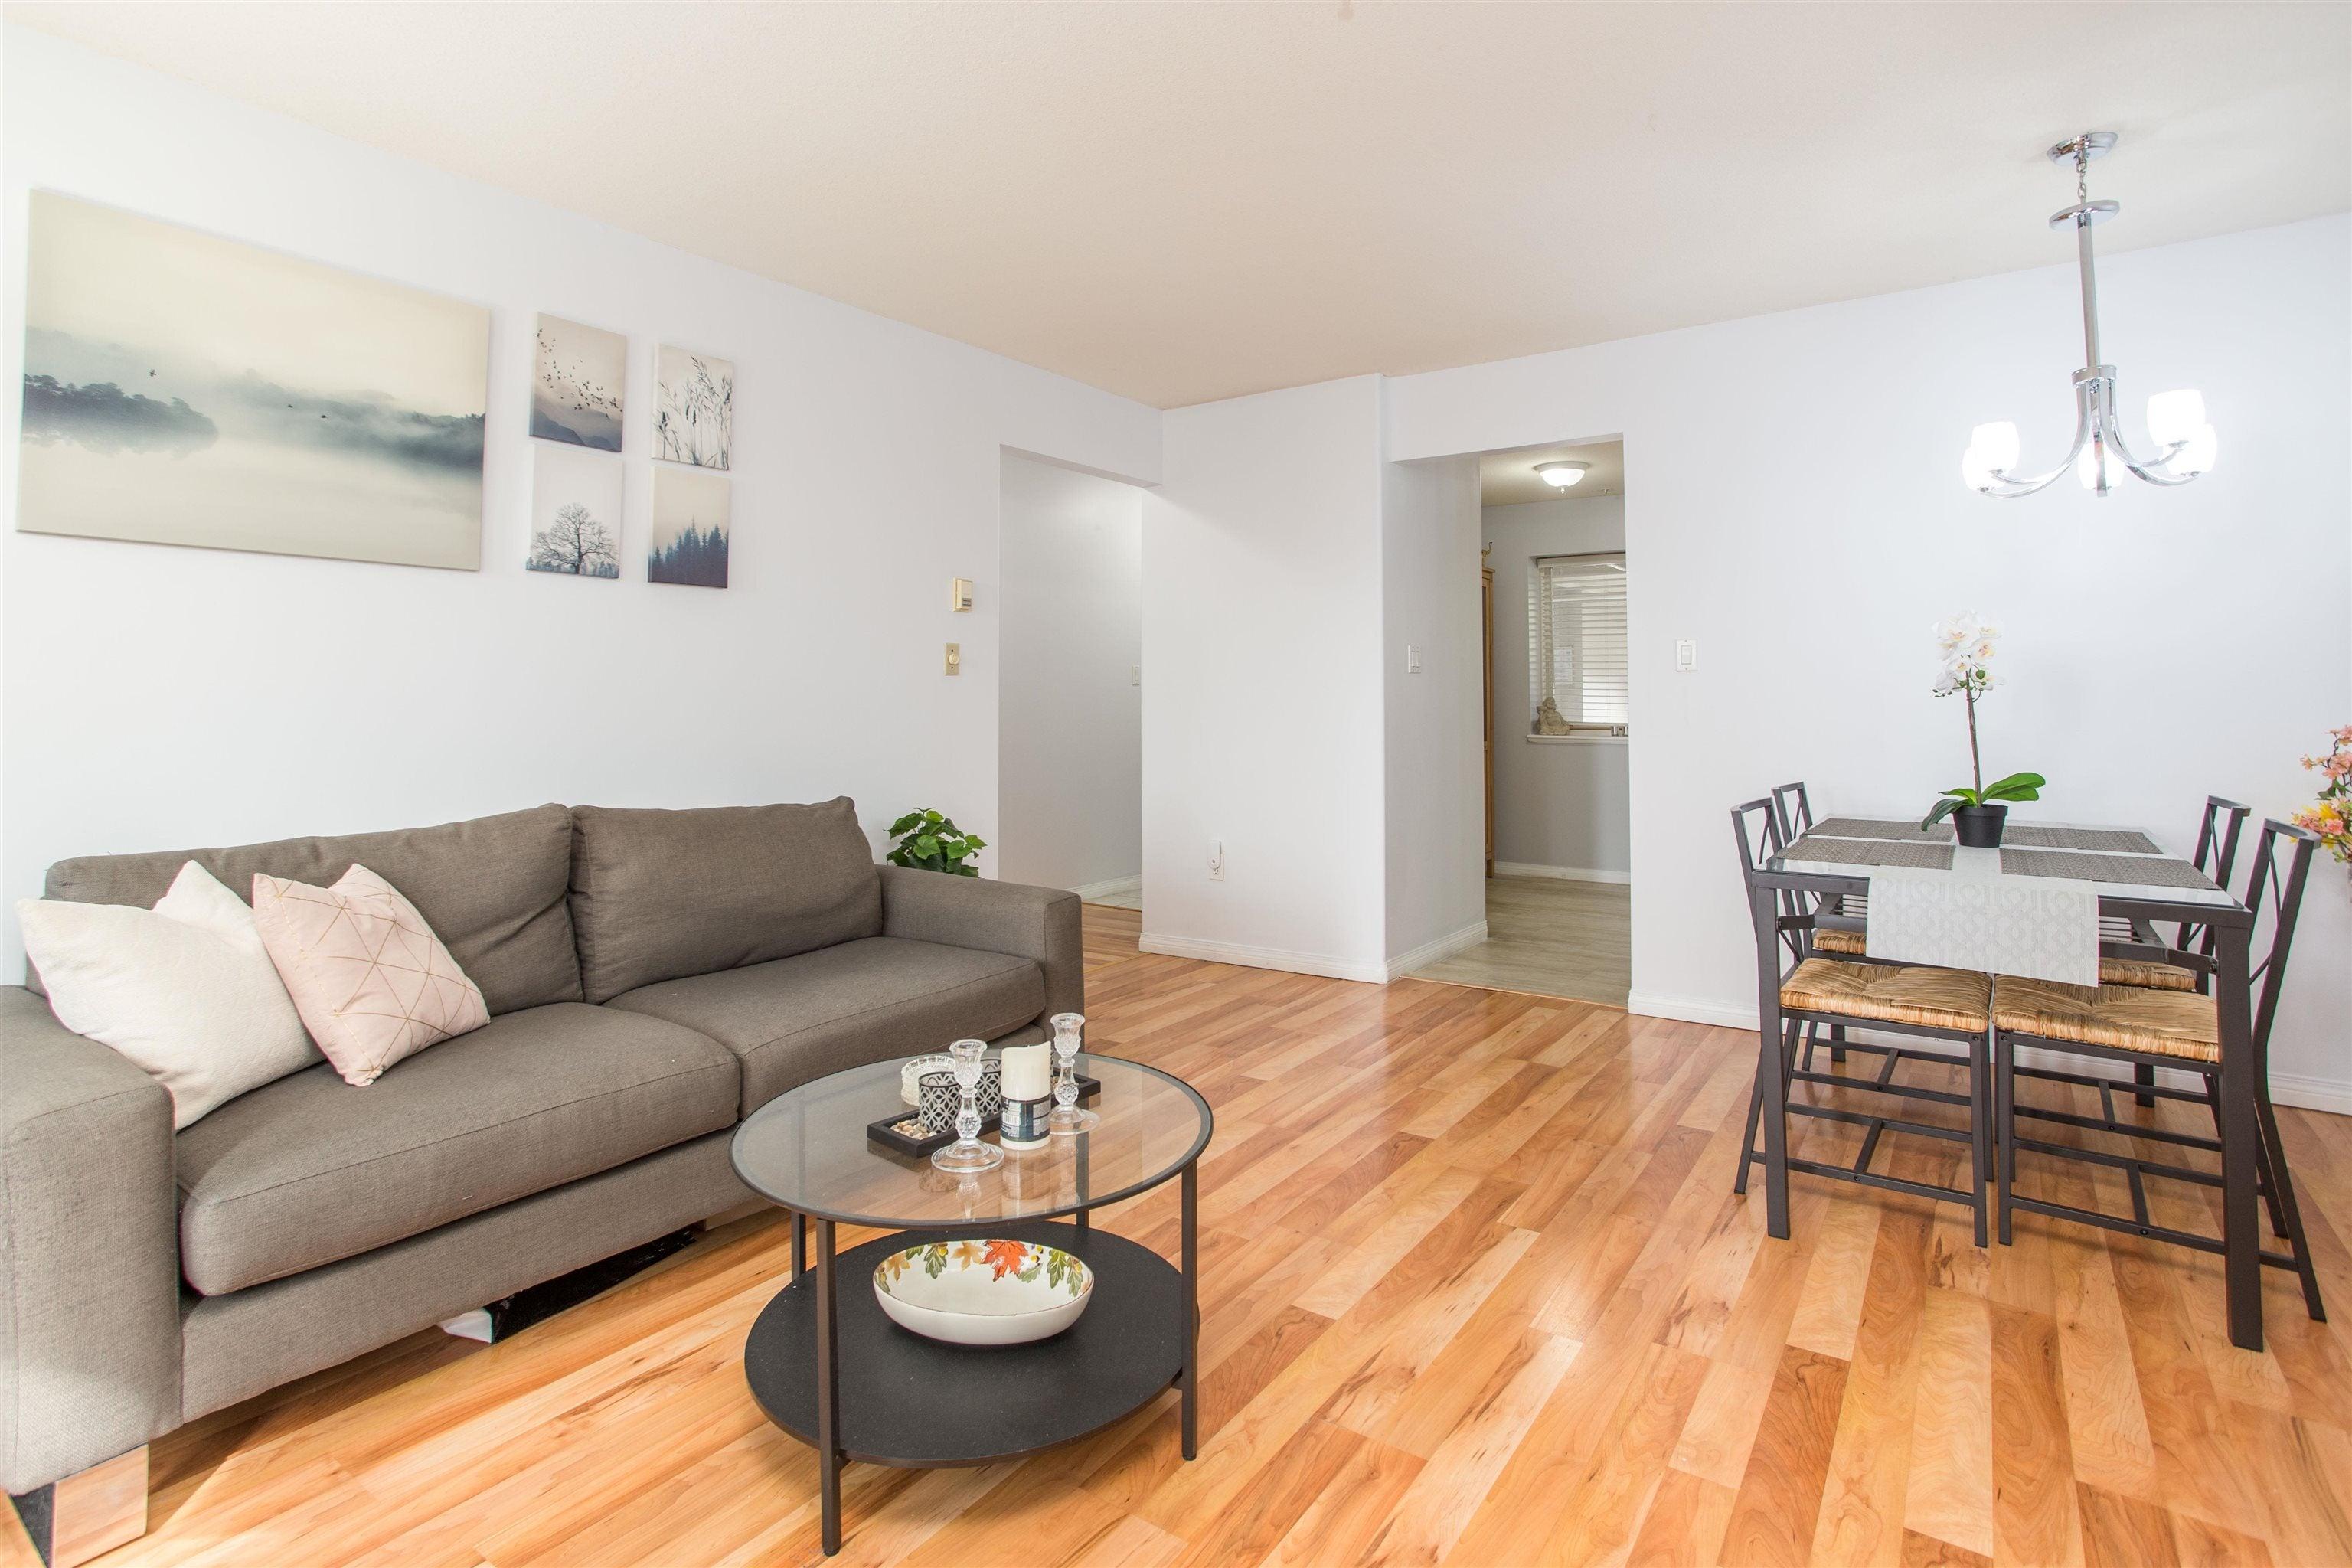 7 205 LEBLEU STREET - Maillardville Apartment/Condo for sale, 3 Bedrooms (R2625671) - #4